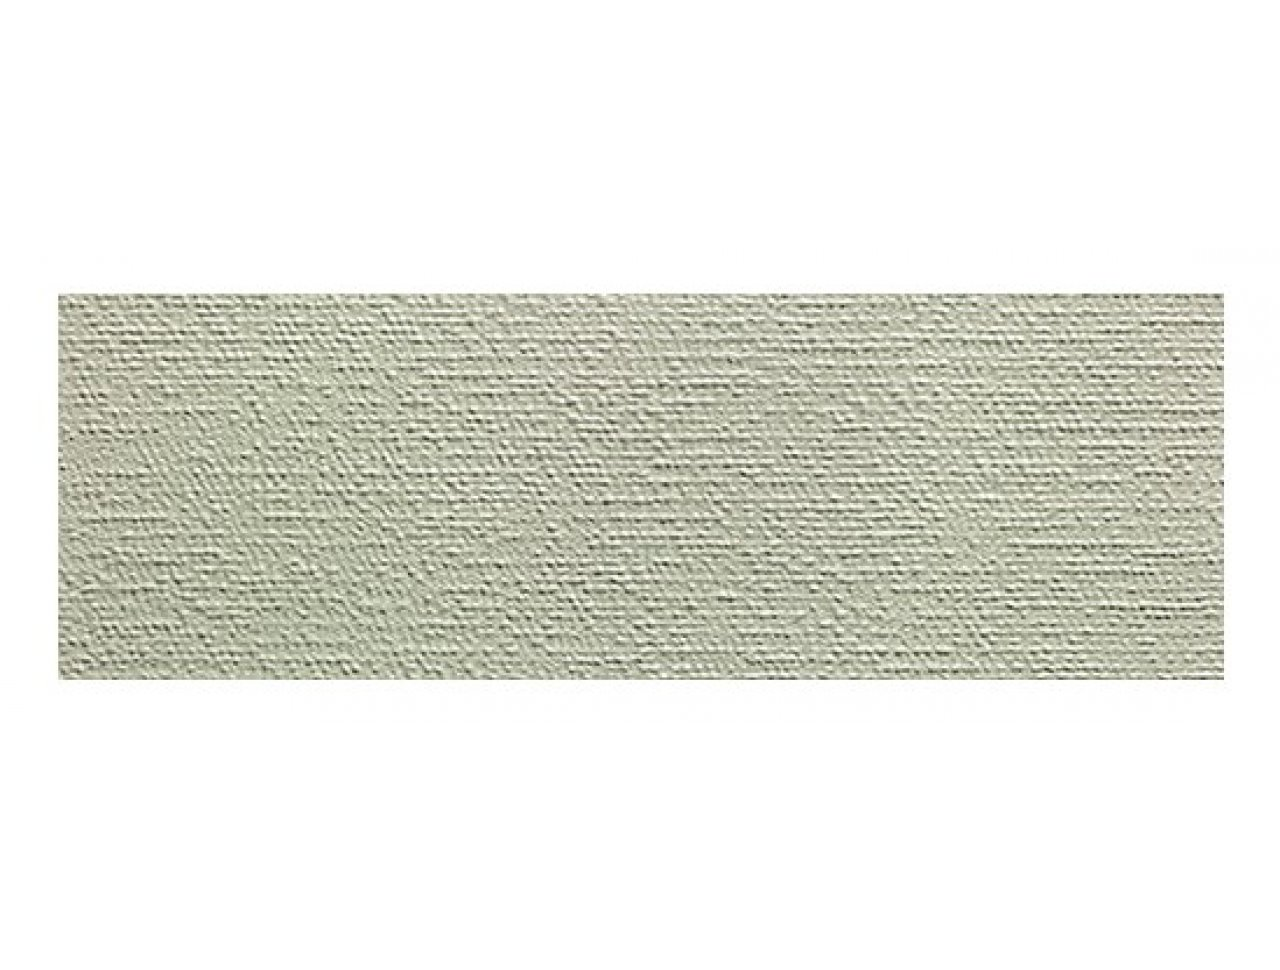 Настенная плитка FAP Color Now Dot Tortora 30.5x91.5 см, Арт. fMRZ